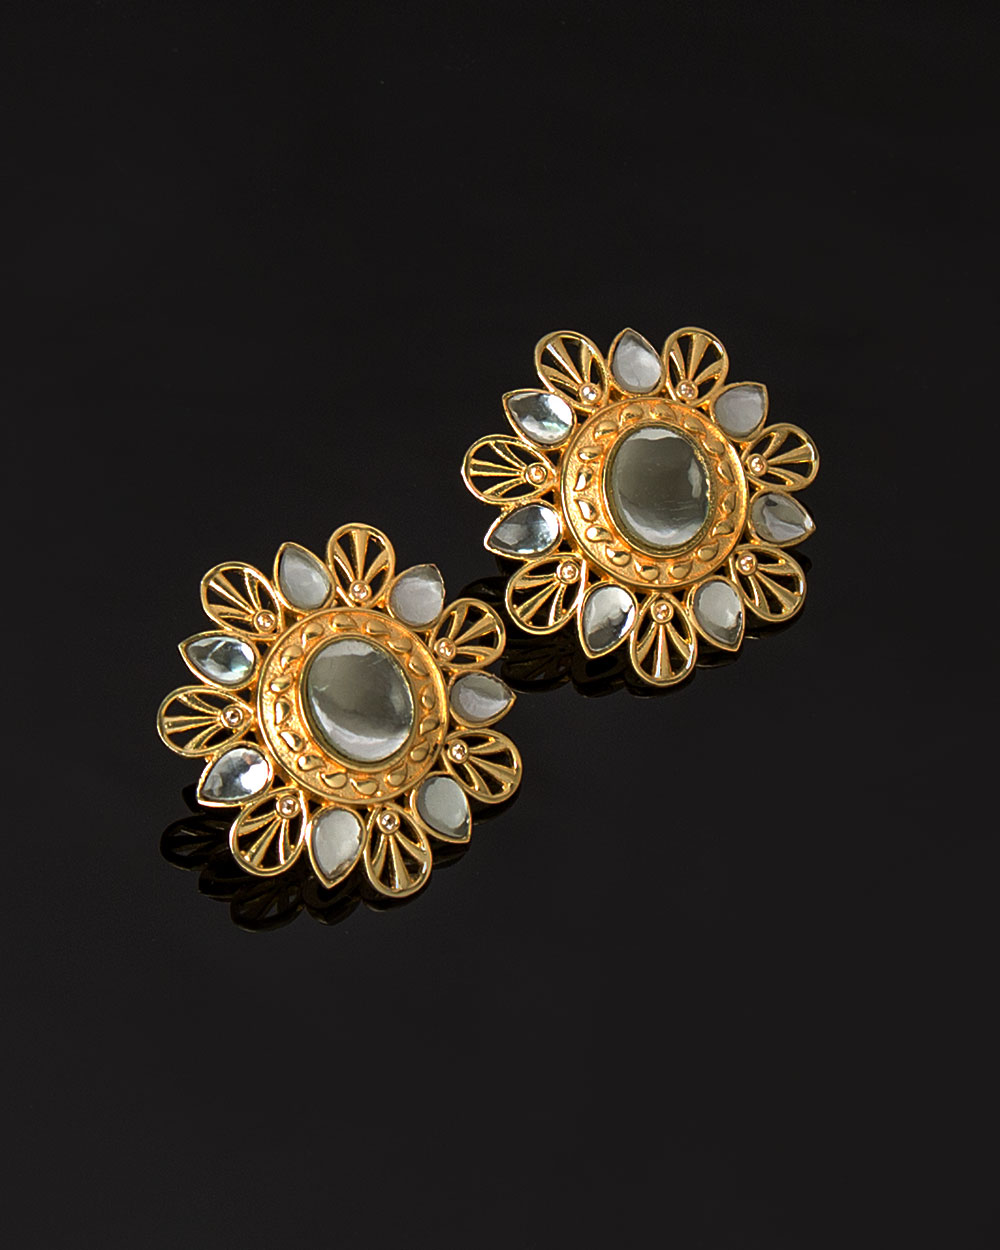 Rajputana Kundan Floral Stud Earrings with Gold Plating | Buy ...